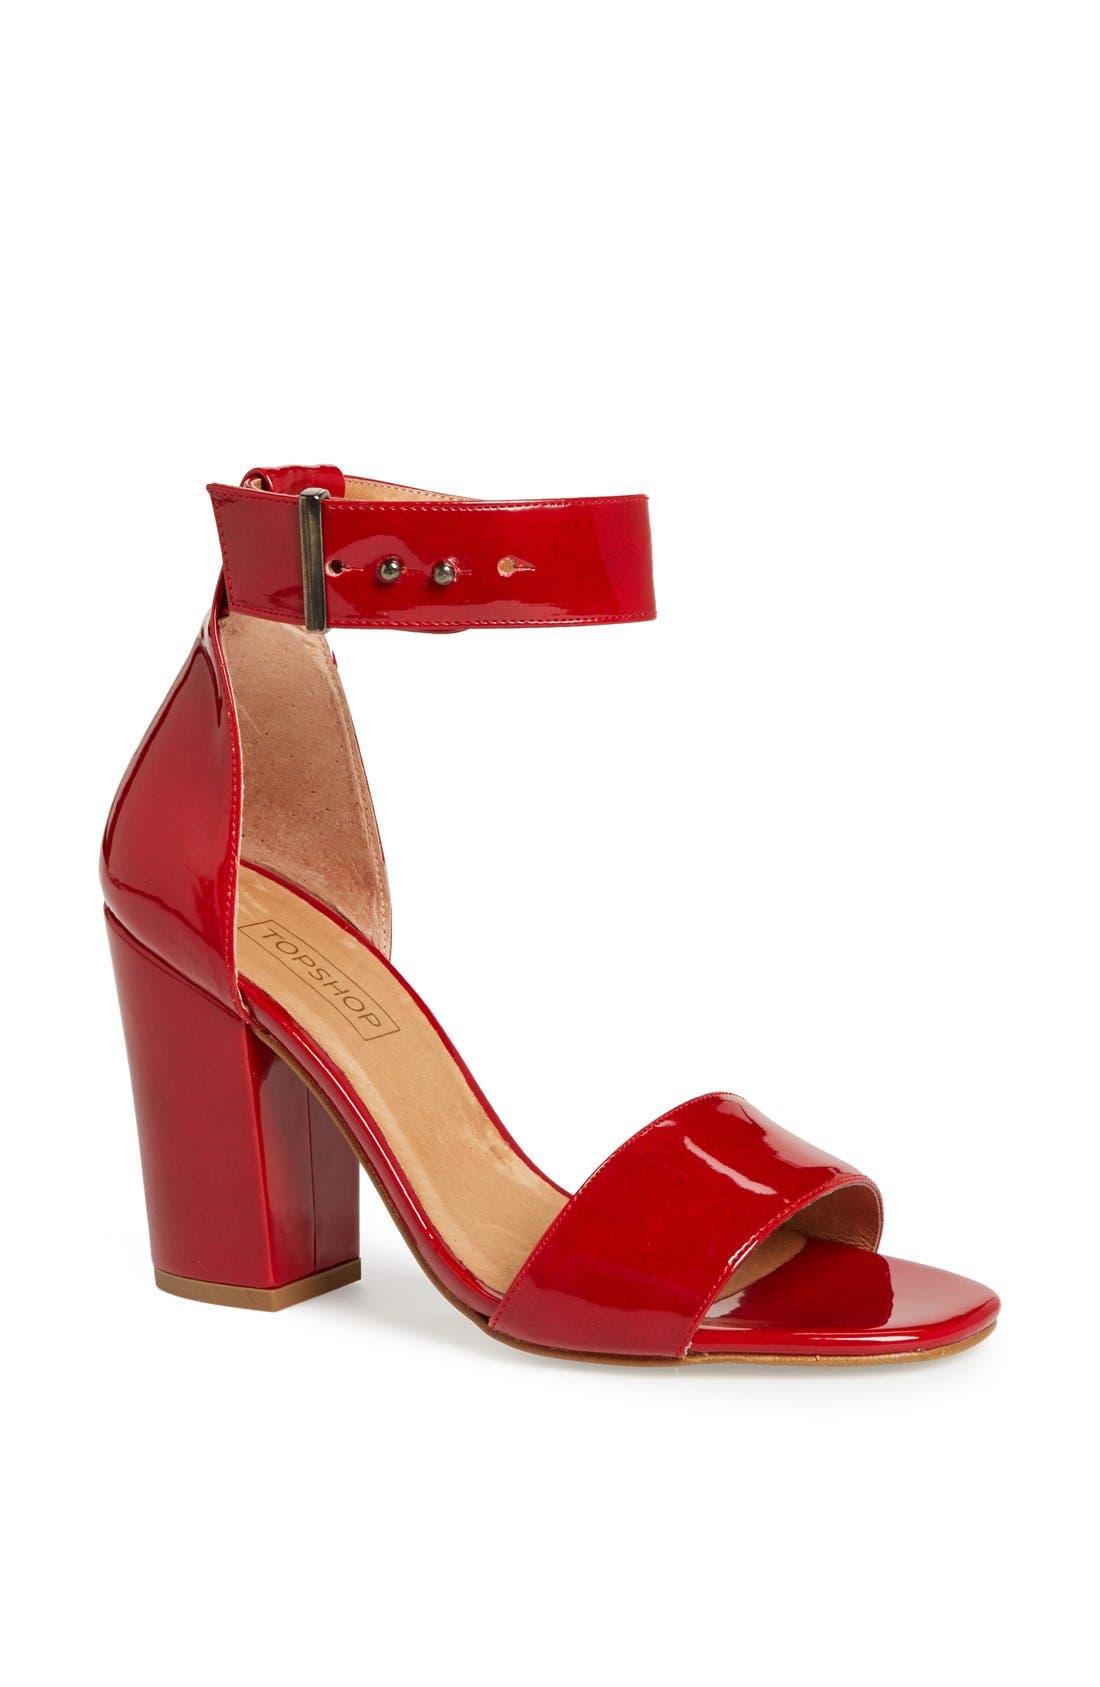 Alternate Image 1 Selected - Topshop 'Ramble' Sandal